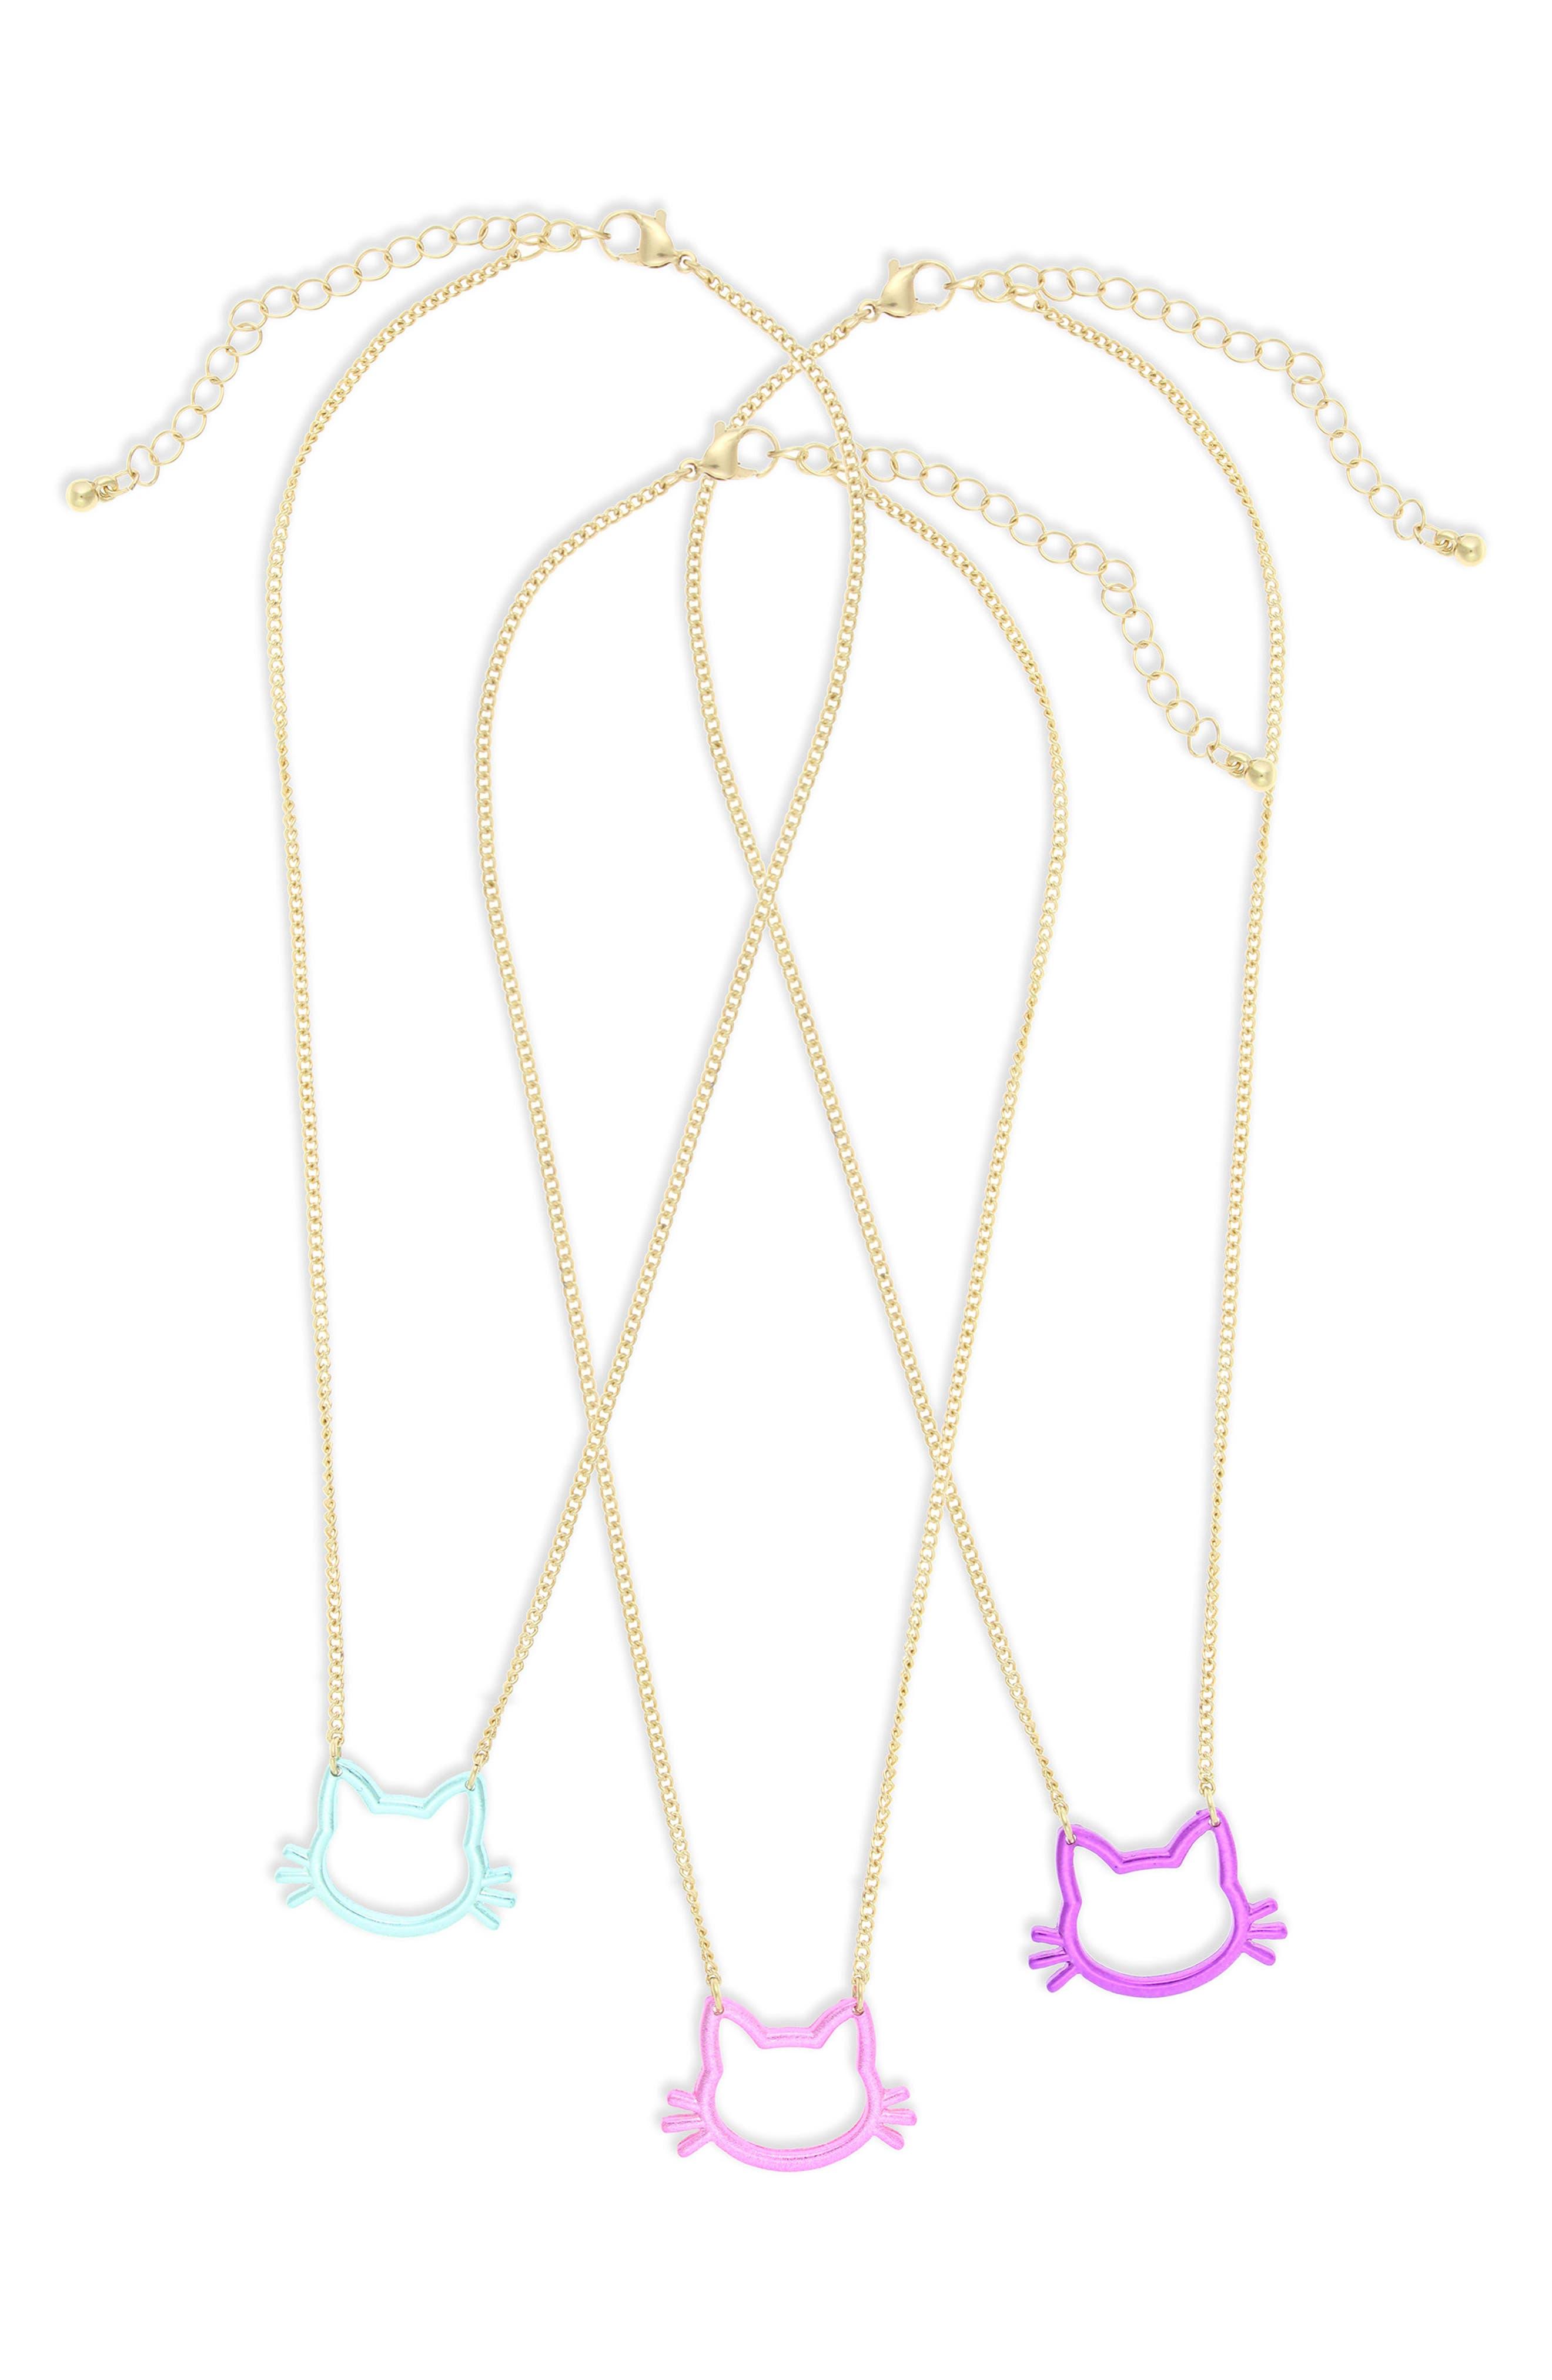 Set of 3 Cat Pendant Necklaces,                         Main,                         color, Pink Multi